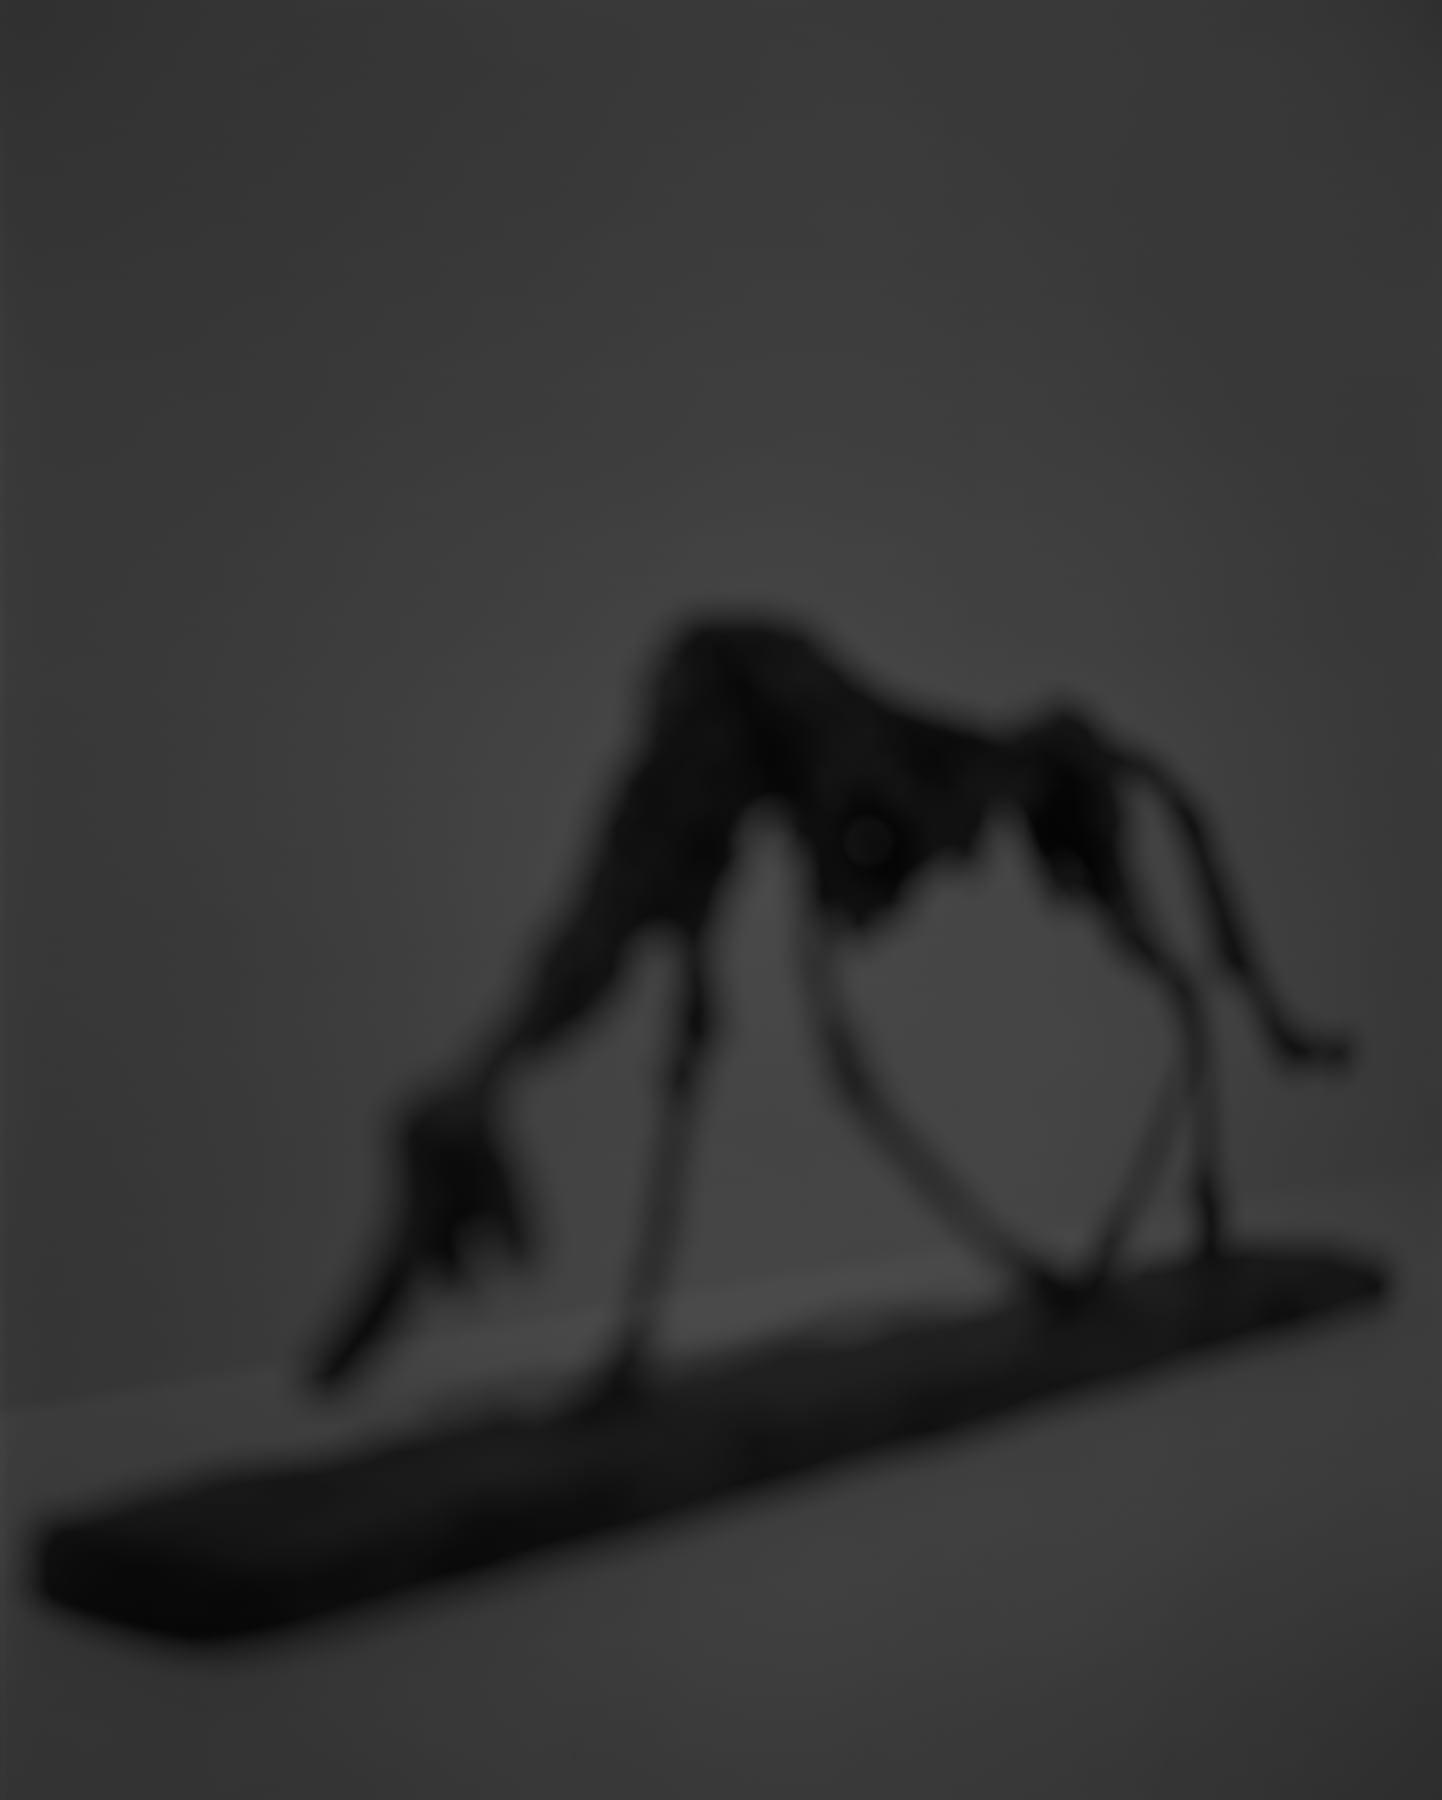 Hiroshi Sugimoto, Past Presence 087, Dog, Alberto Giacometti, 2018